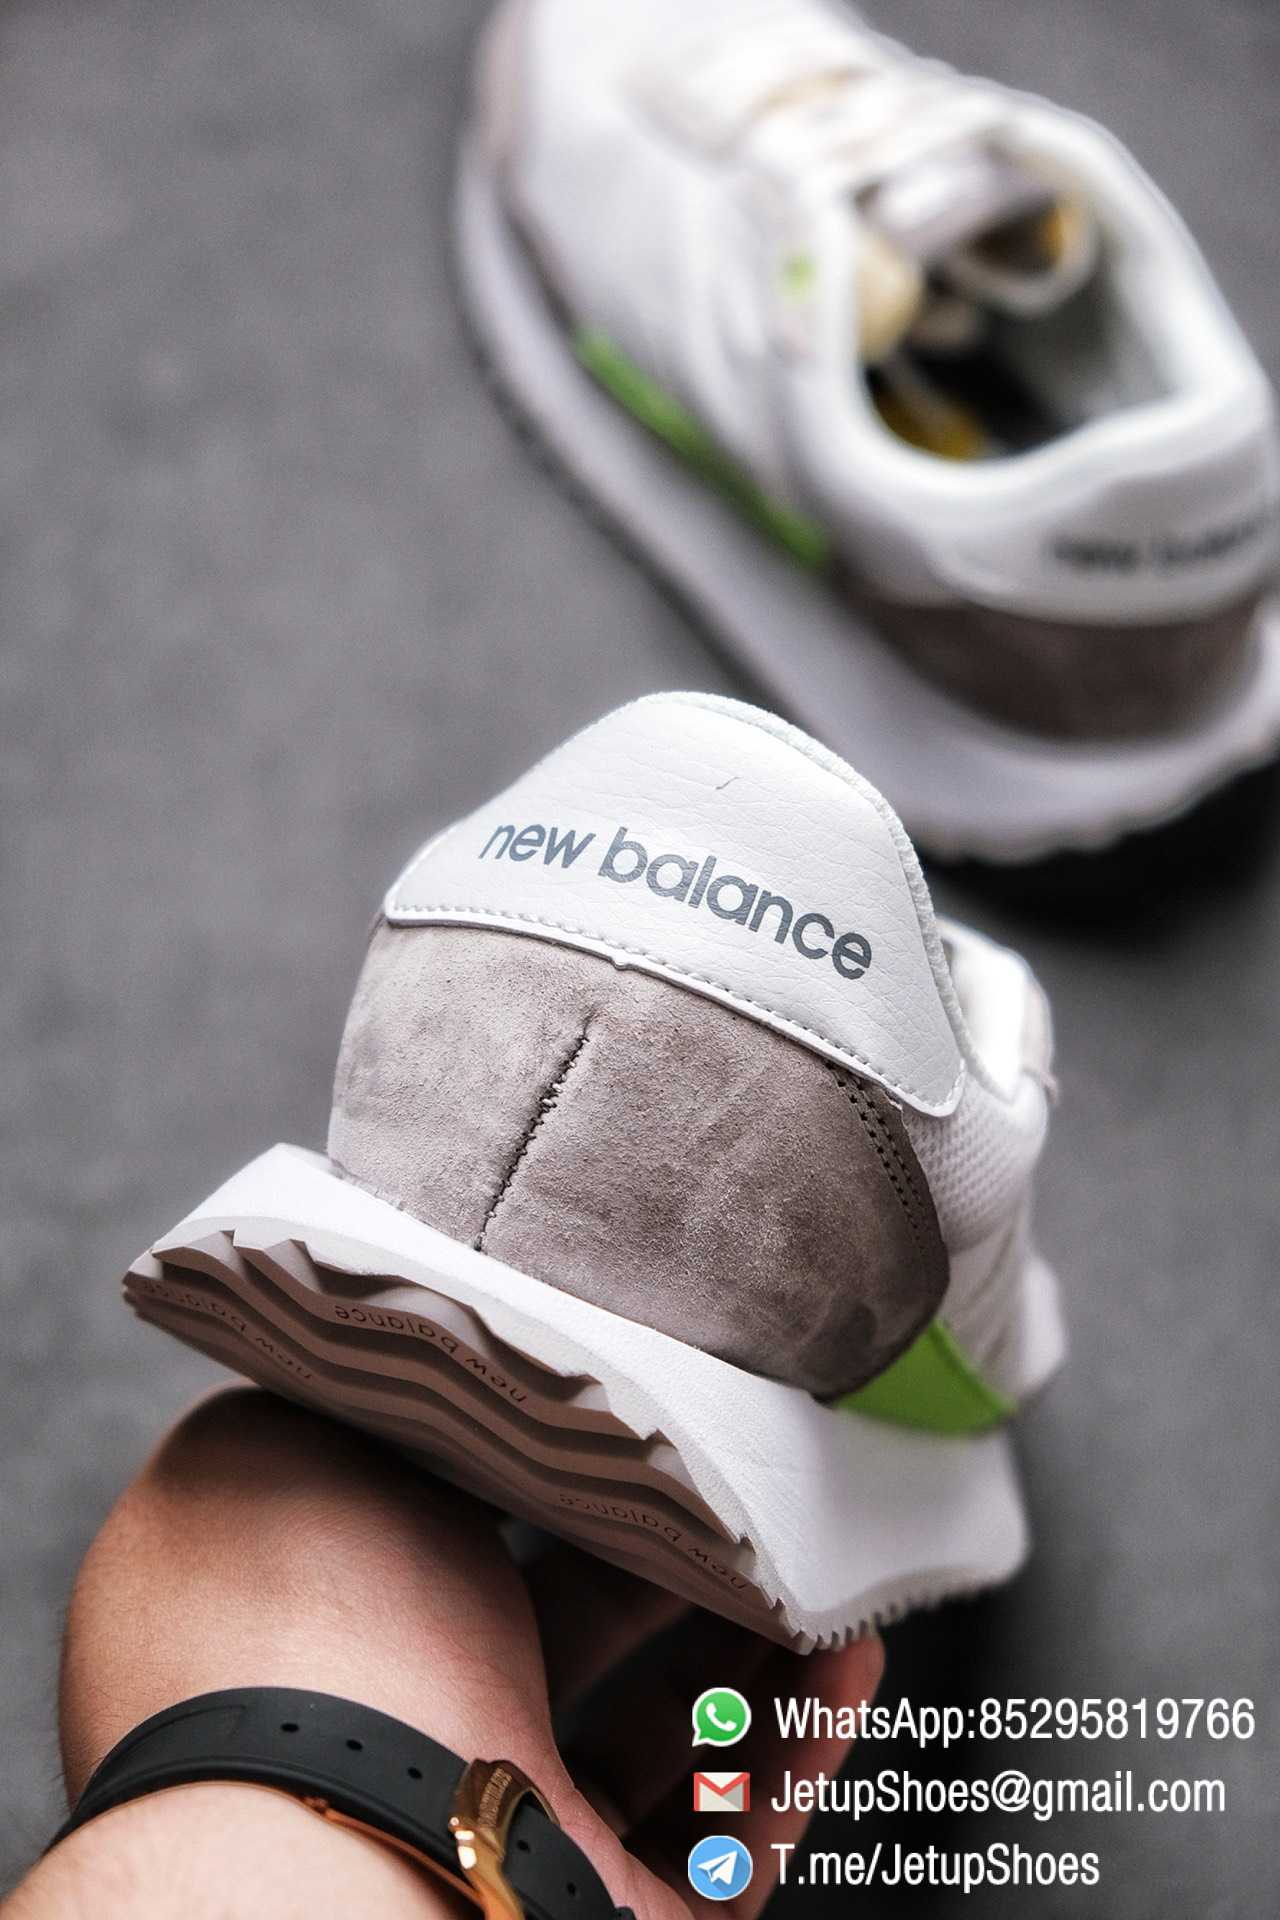 Best Replica New Balance 237 Niko x 237 Grey Green SKU MS237SL1 High Quality Fake Sneakers 08